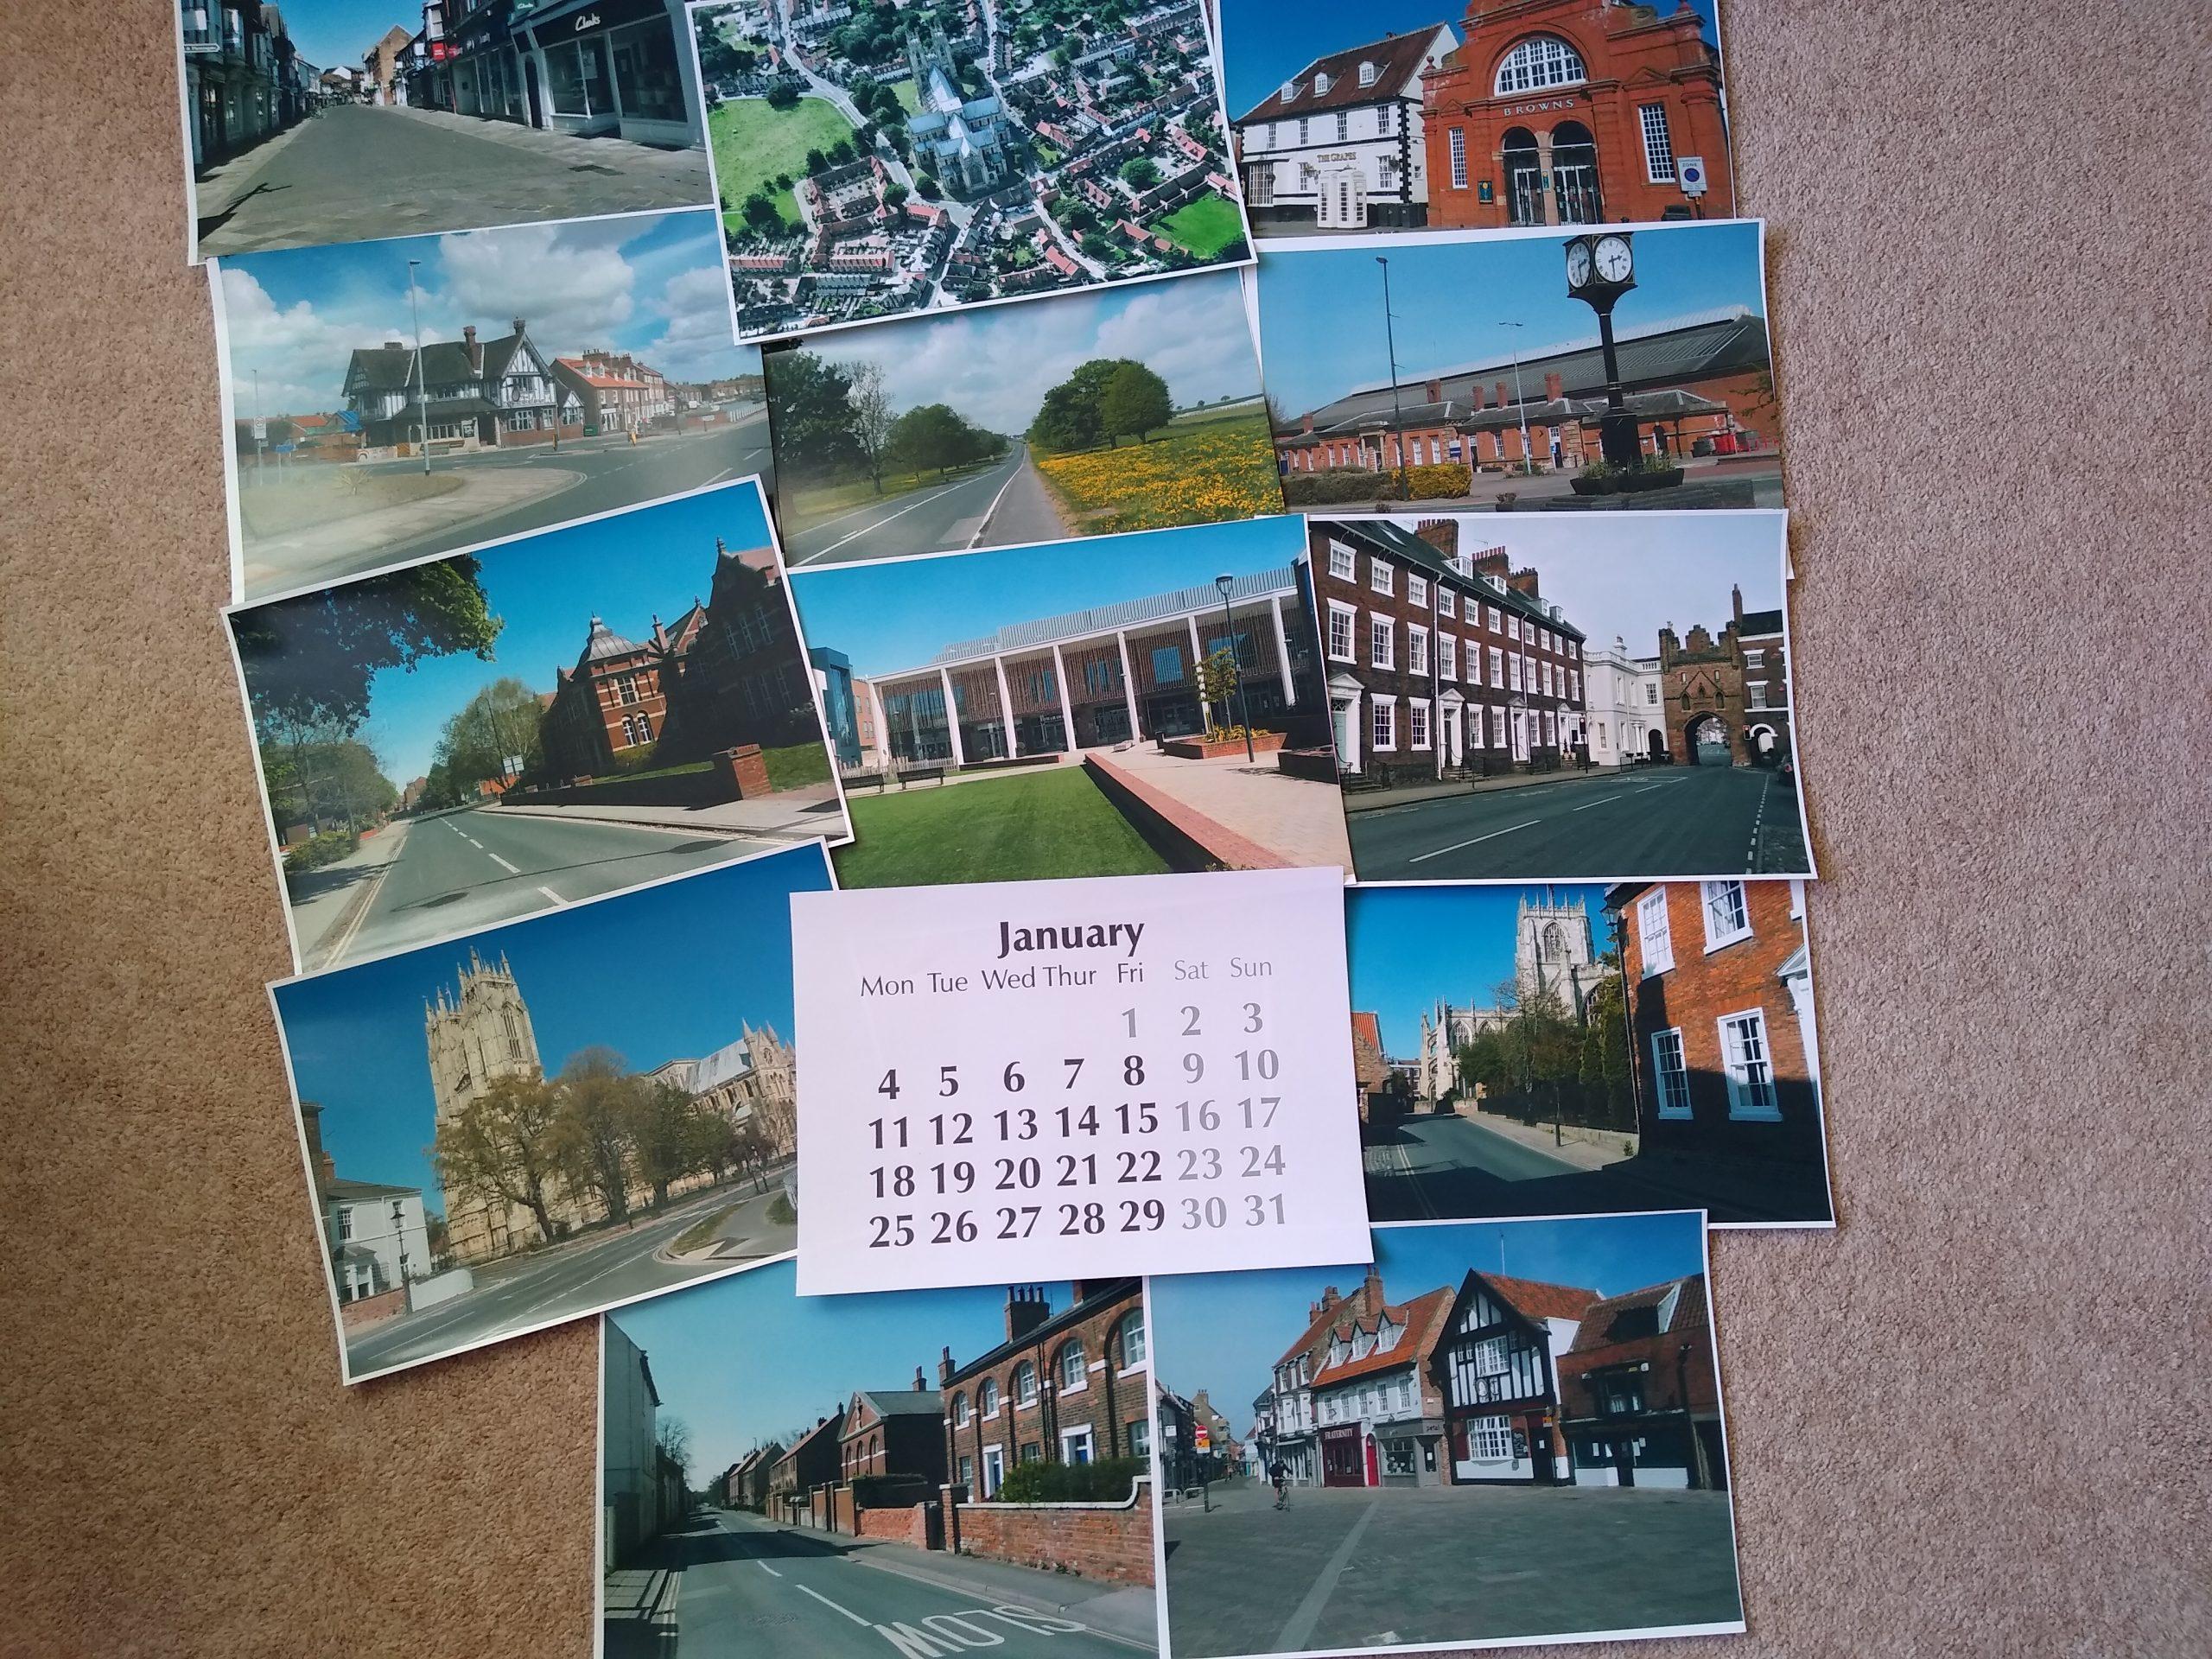 Beverley Calendar images